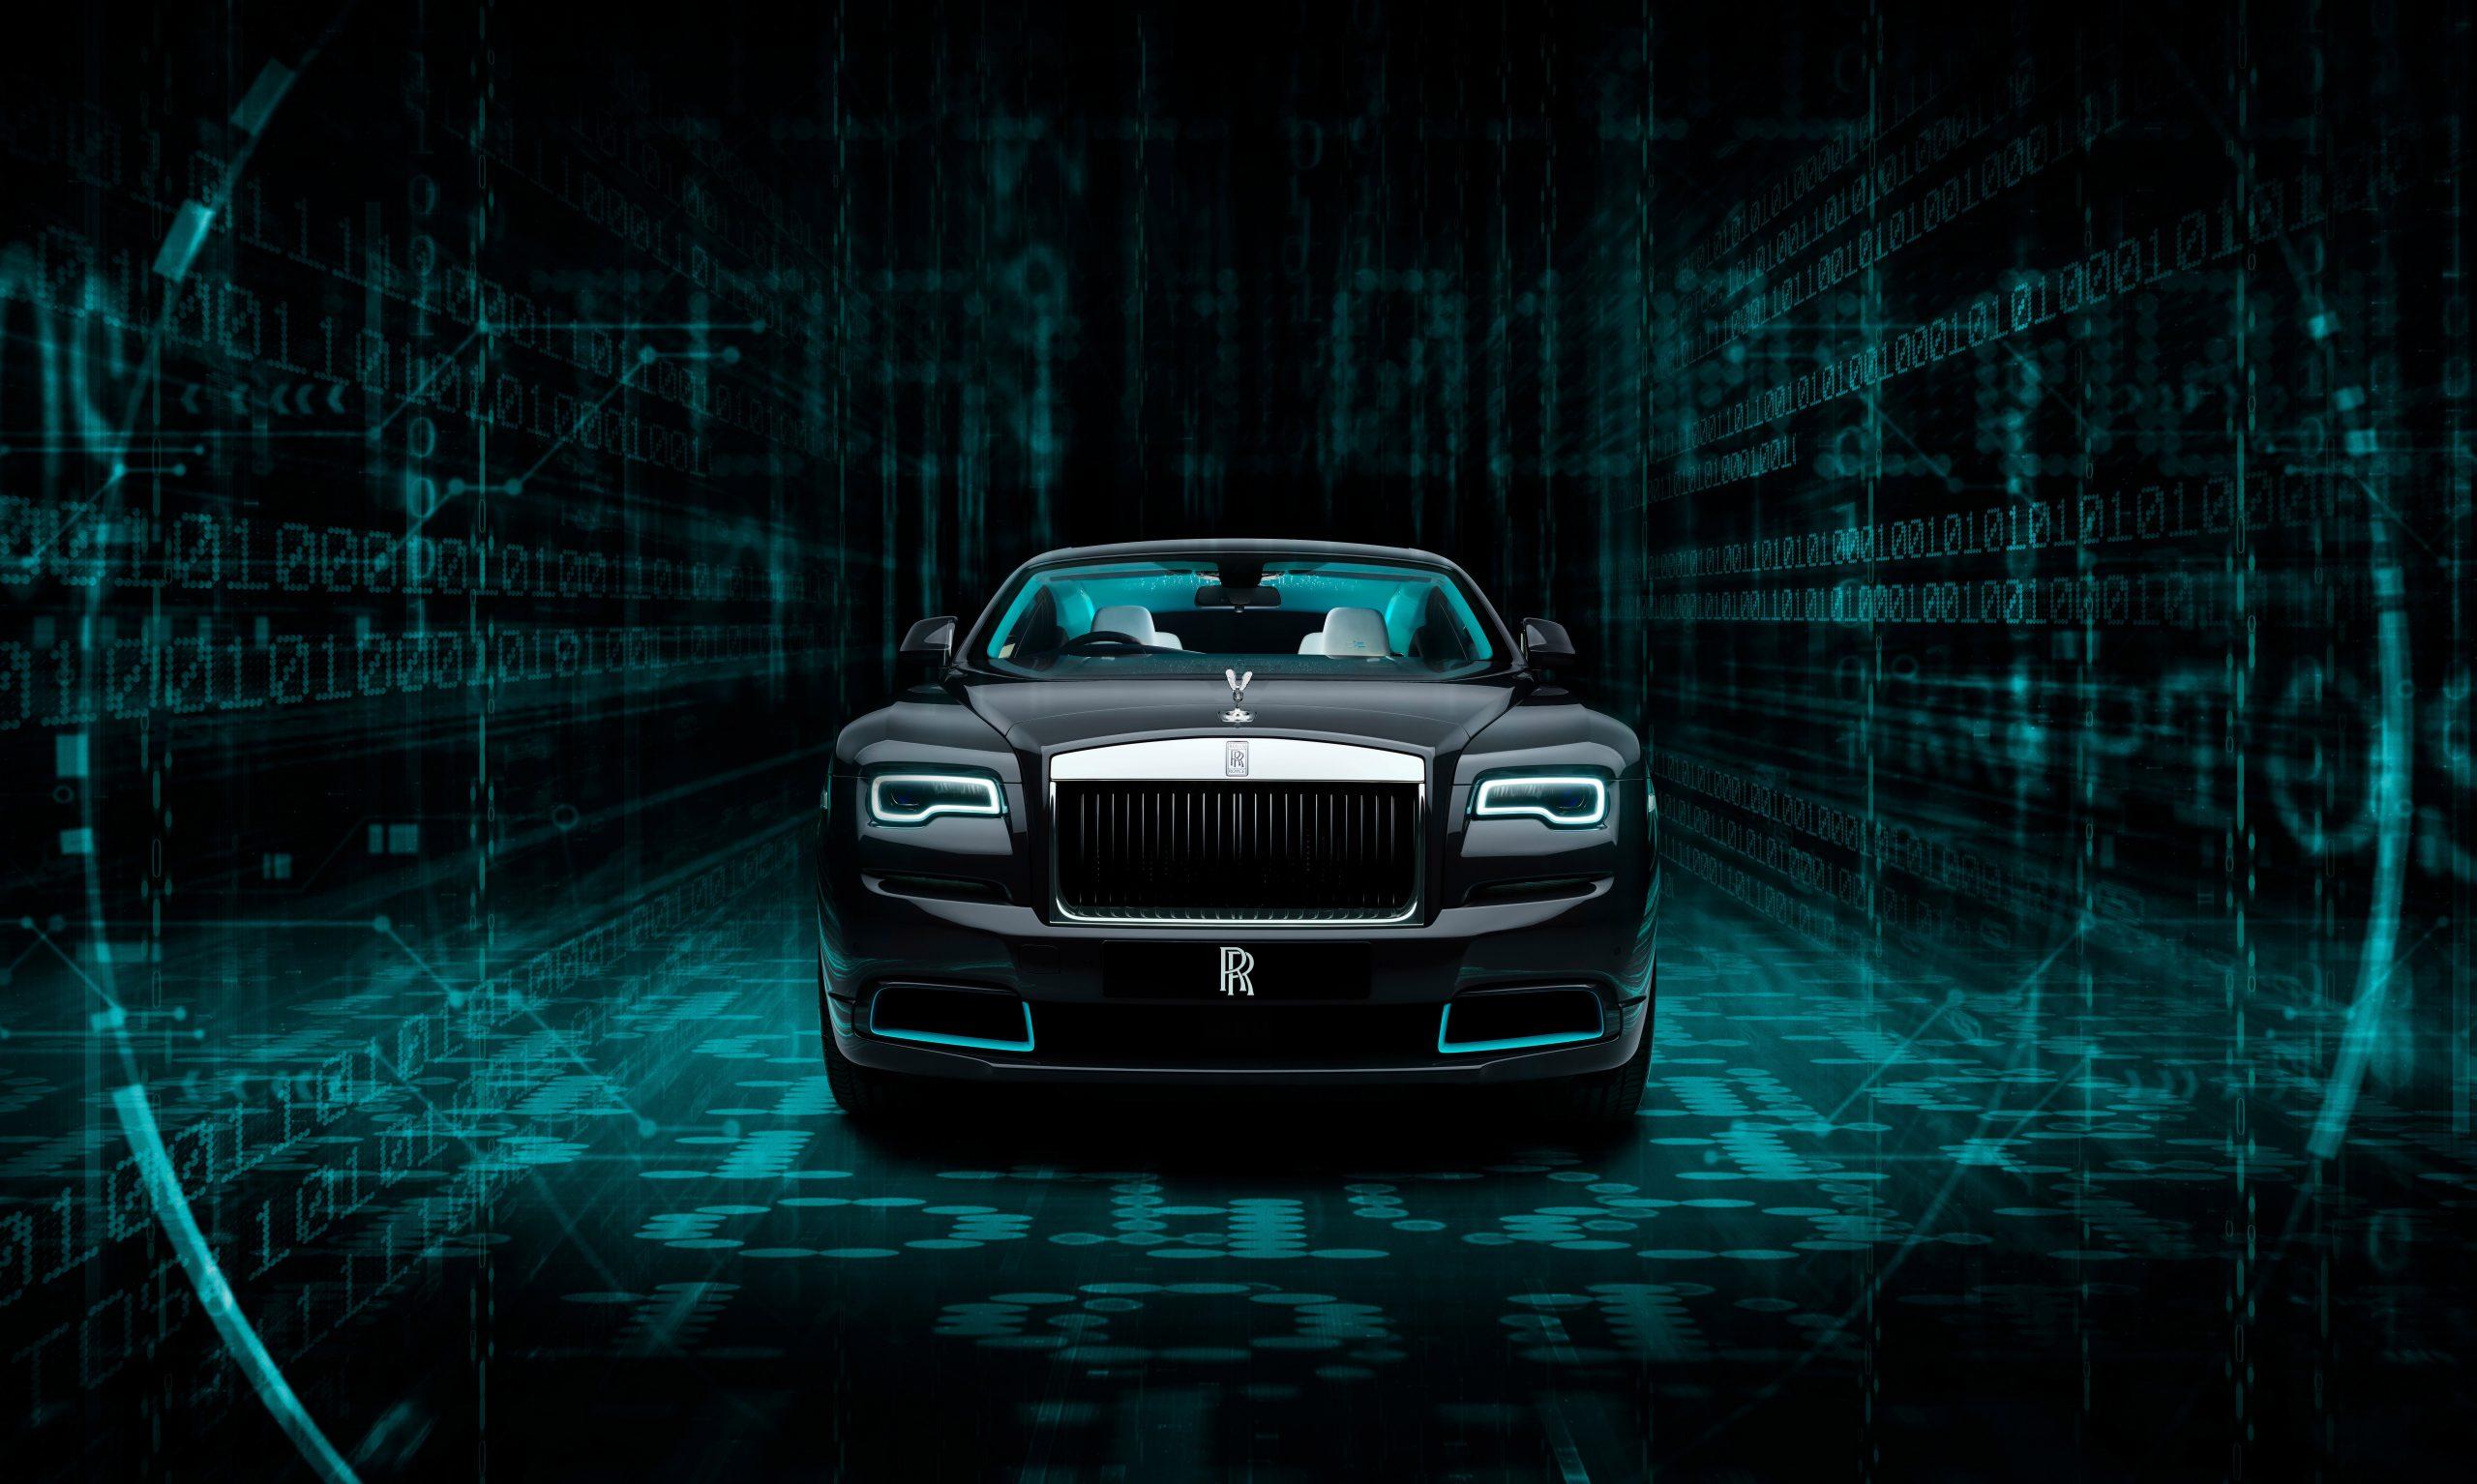 EXCLUSIVE INTERVIEW: Dengan Dua Desainer Rolls-Royce Wraith Kryptos Rp 15 M (Bagian 1)